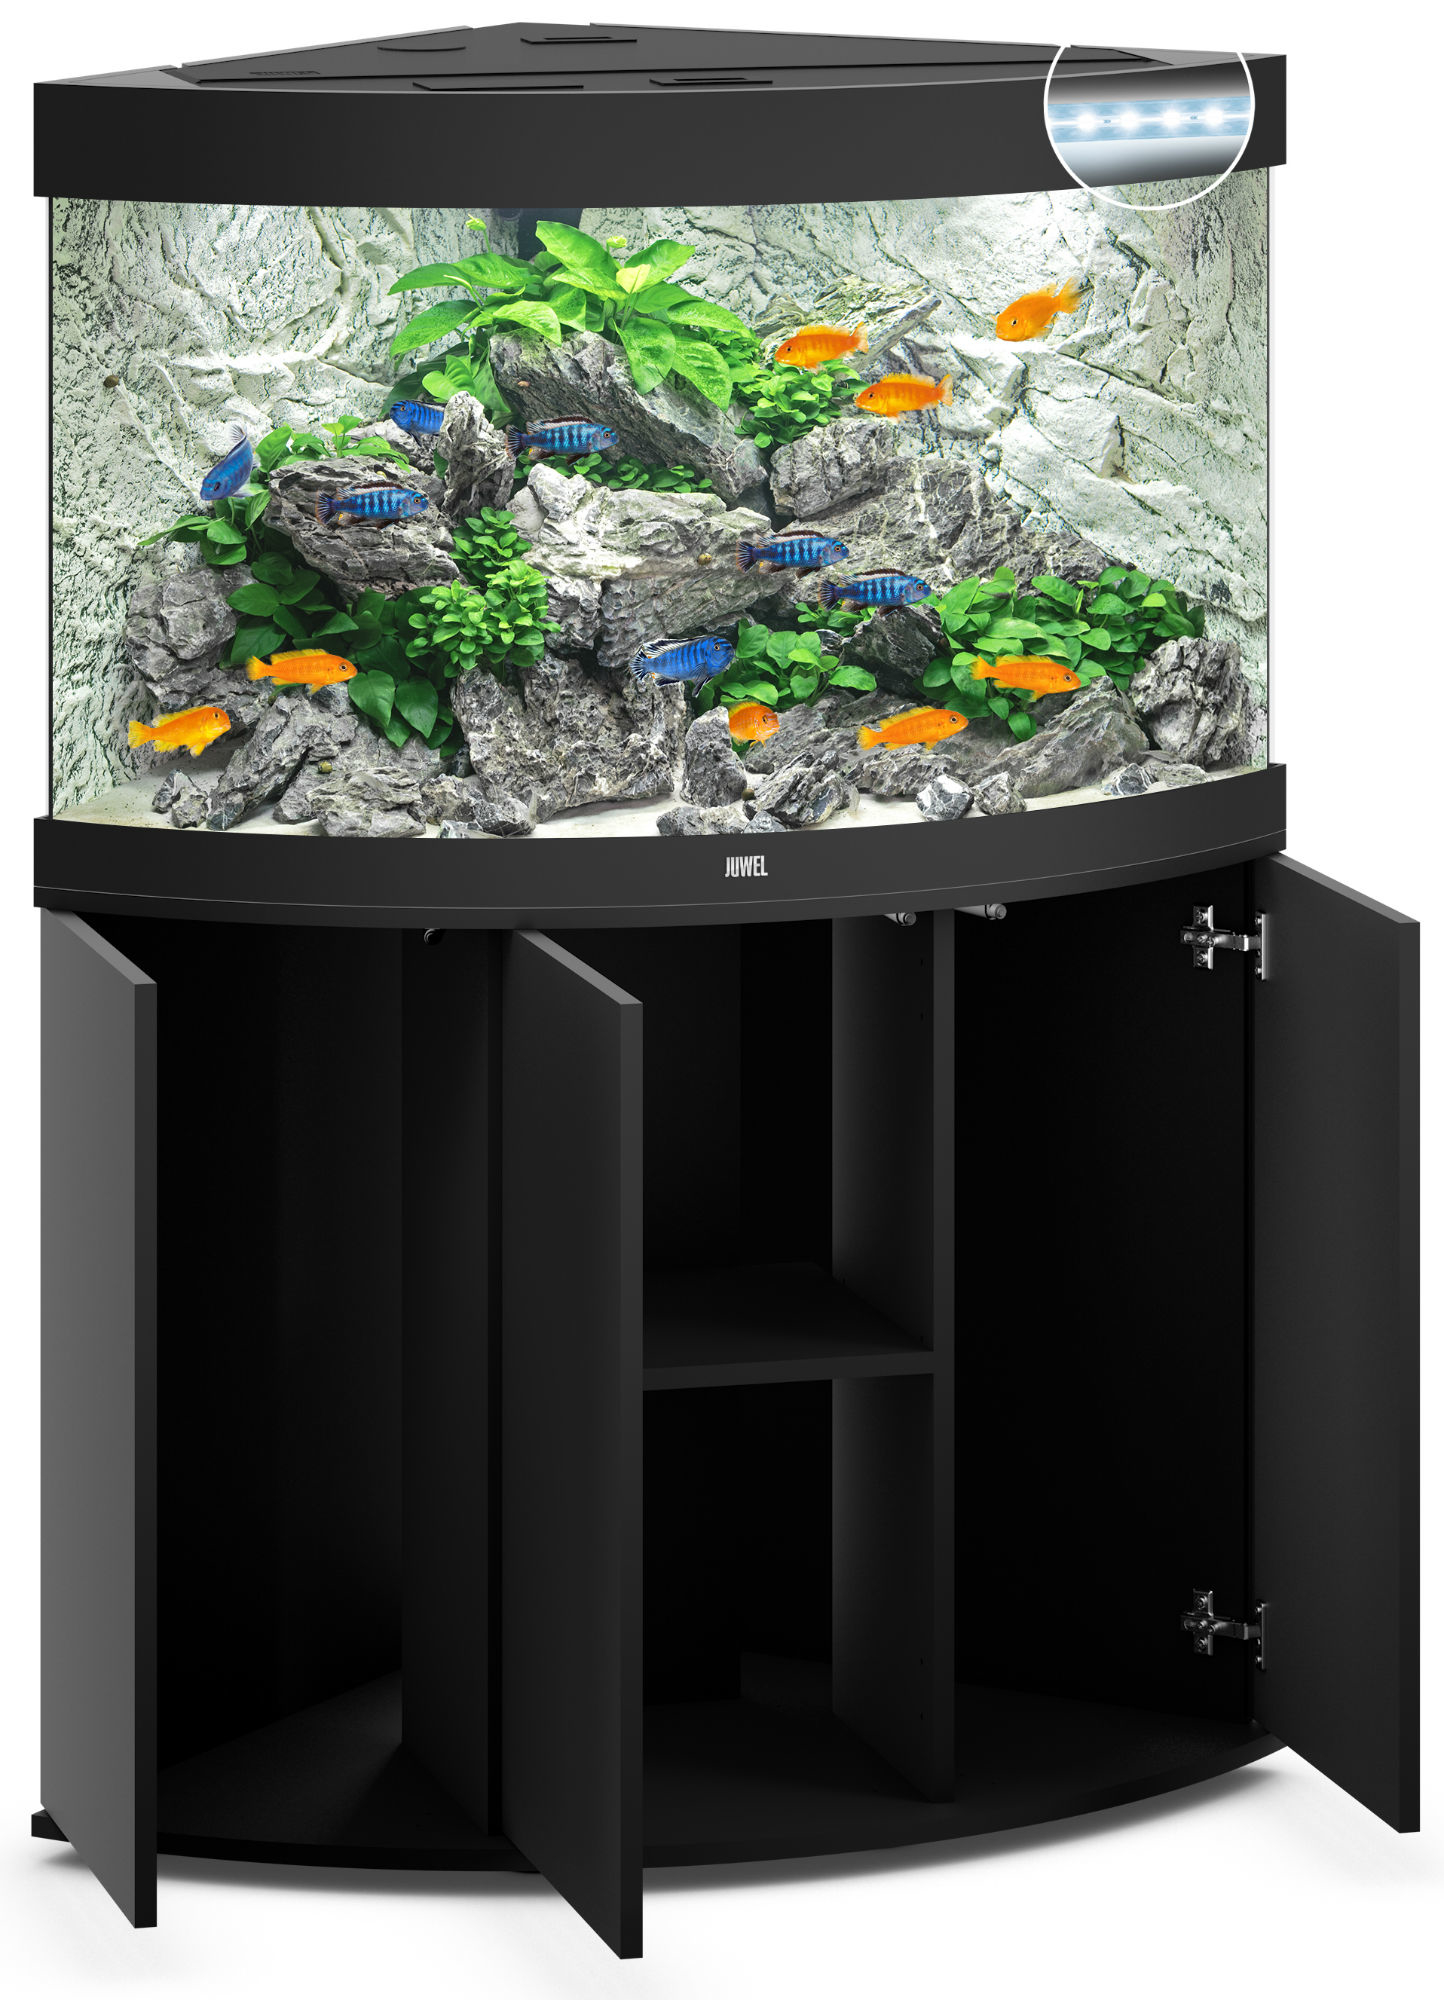 juwel trigon 190 led eck aquarium mit unterschrank ebay. Black Bedroom Furniture Sets. Home Design Ideas